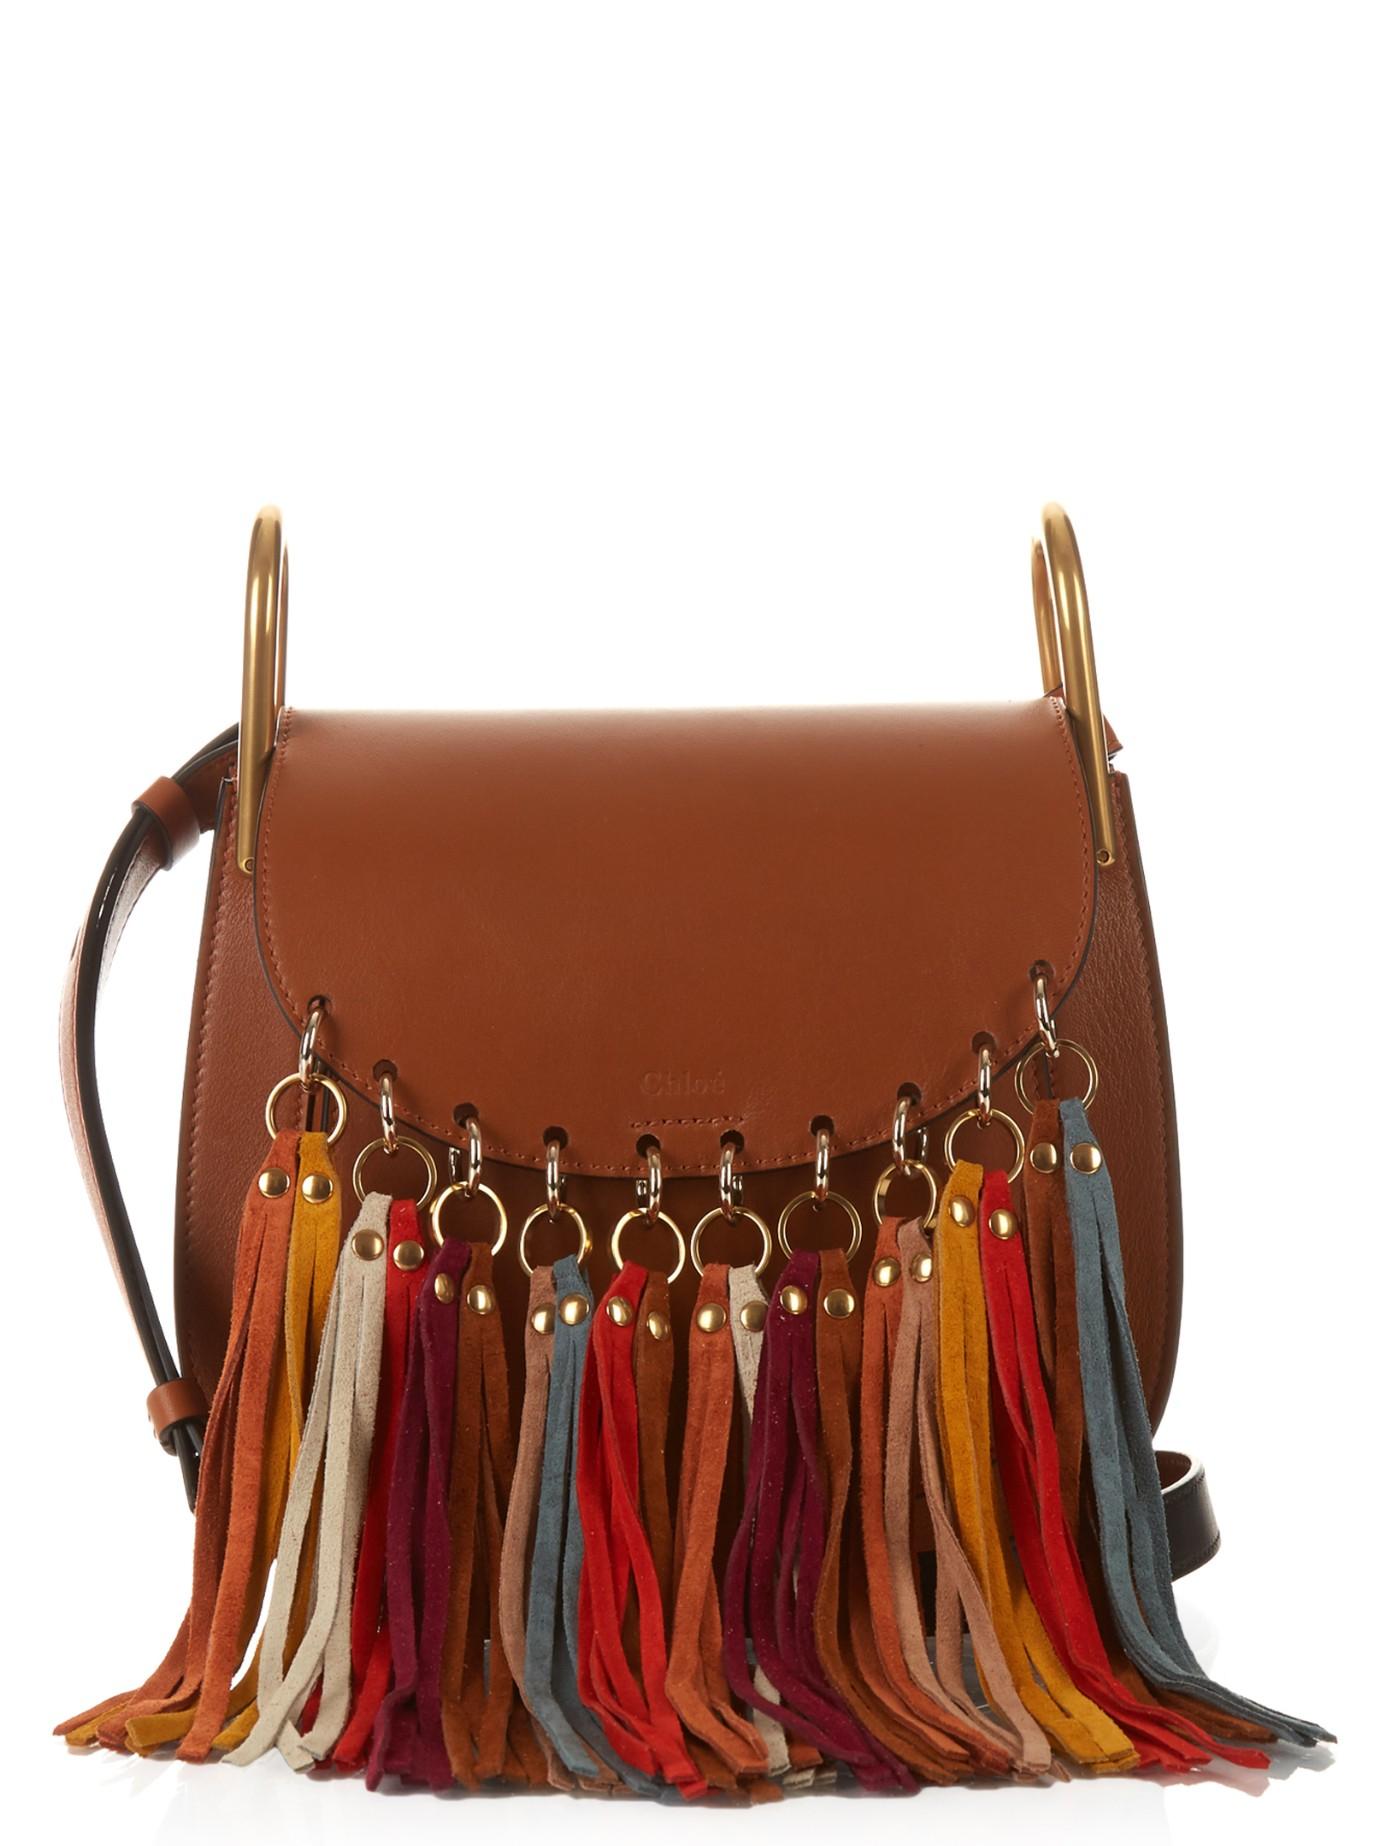 chleo handbags - chloe hudson suede tassel leather cross-body bag, chloe replica ...